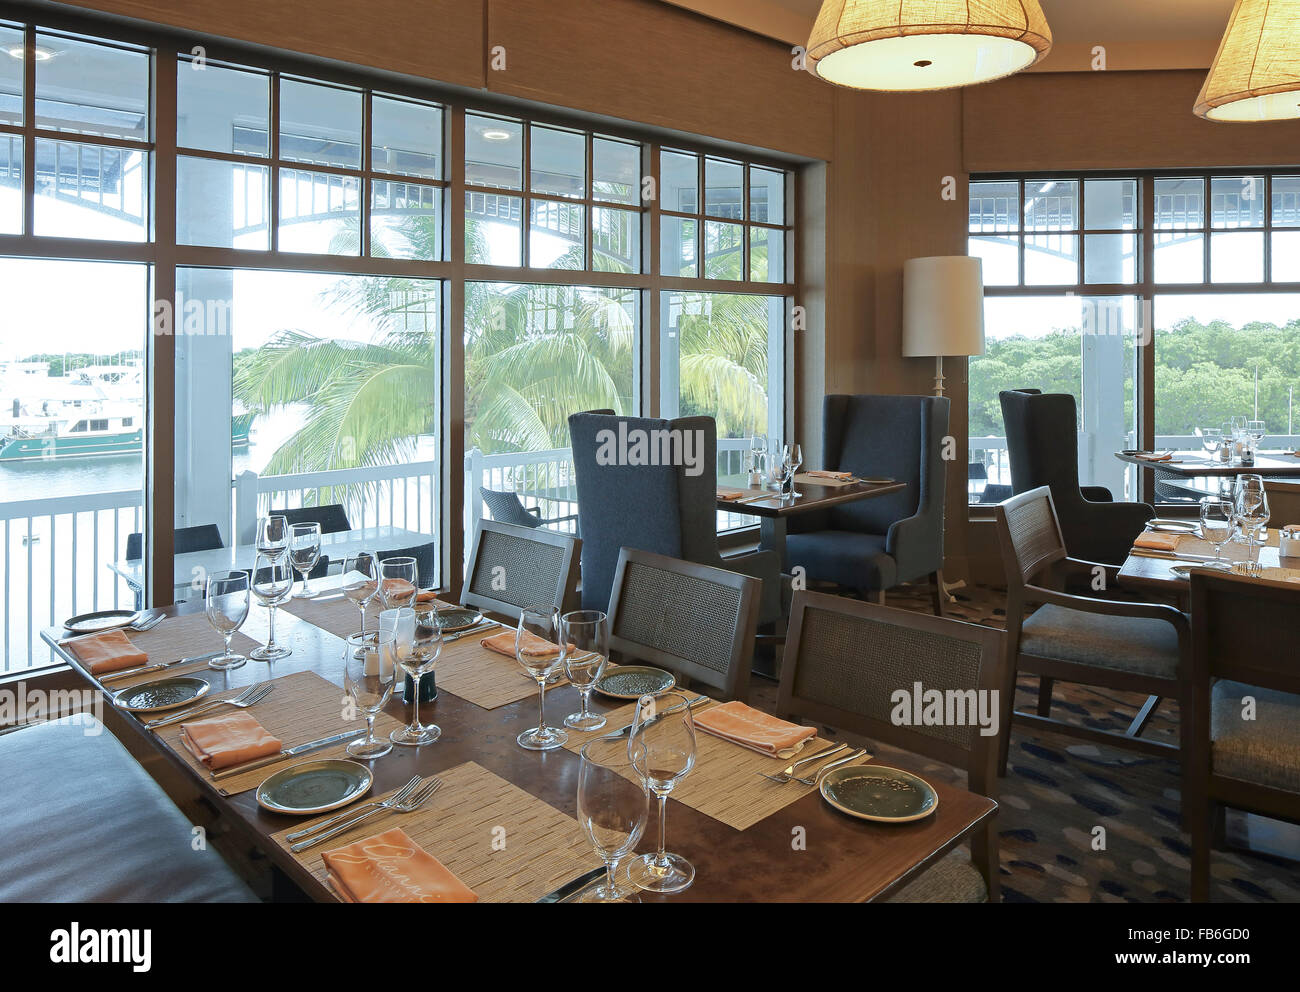 Interior view of restaurant with marina view Gianni Ristorante Key